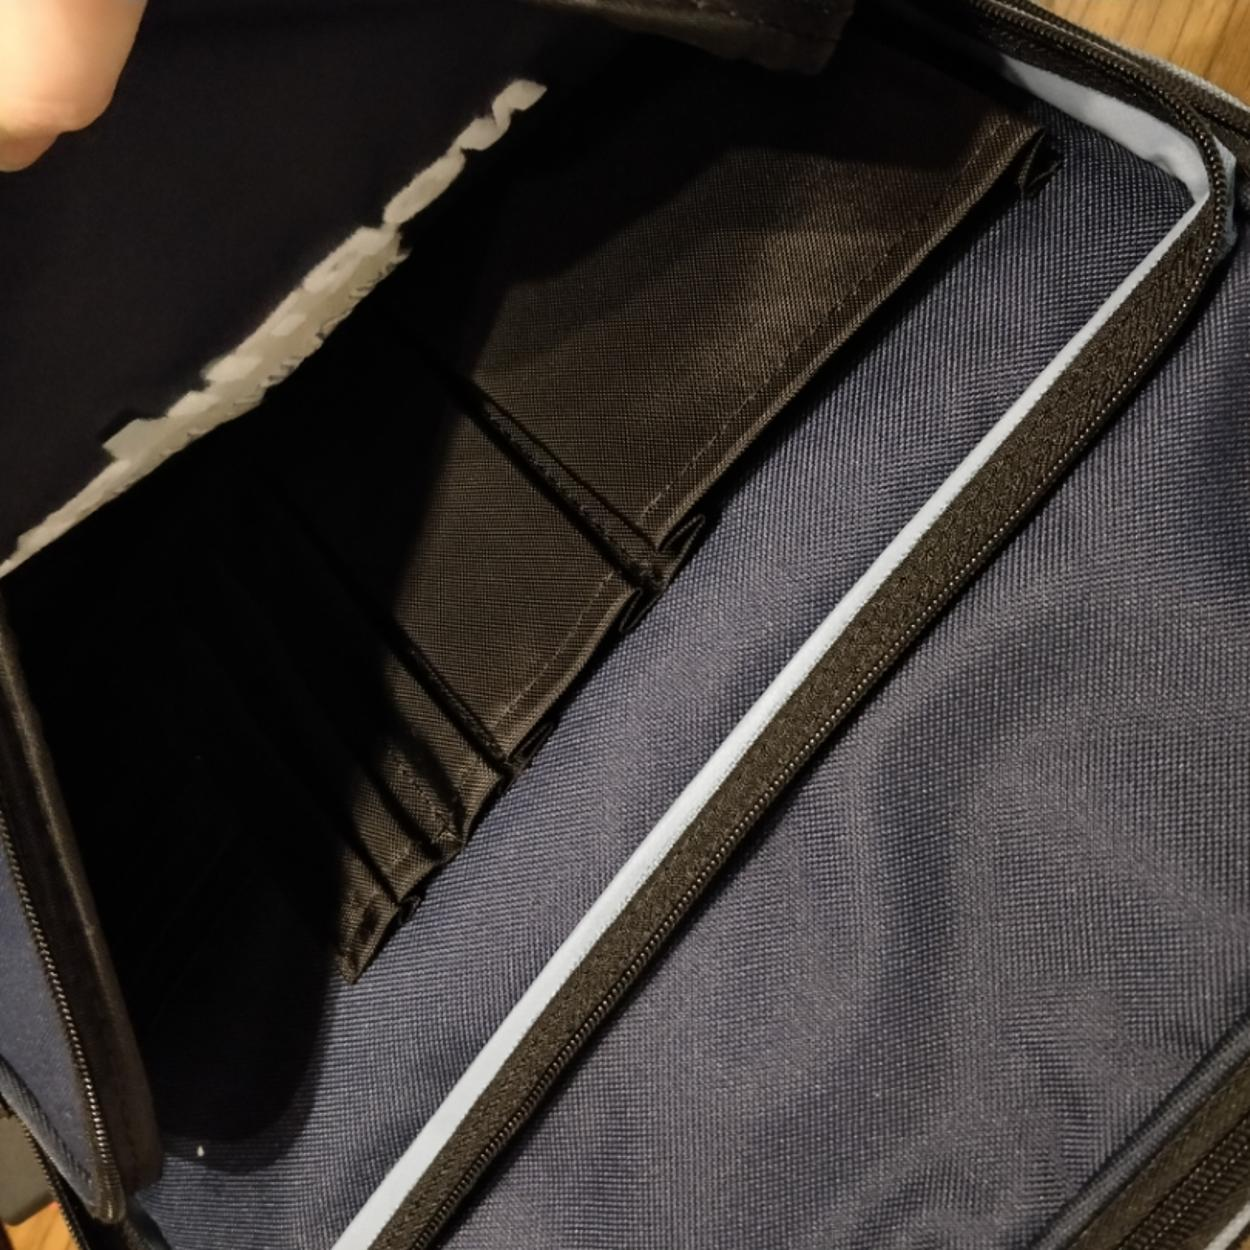 The North Face Askılı çanta